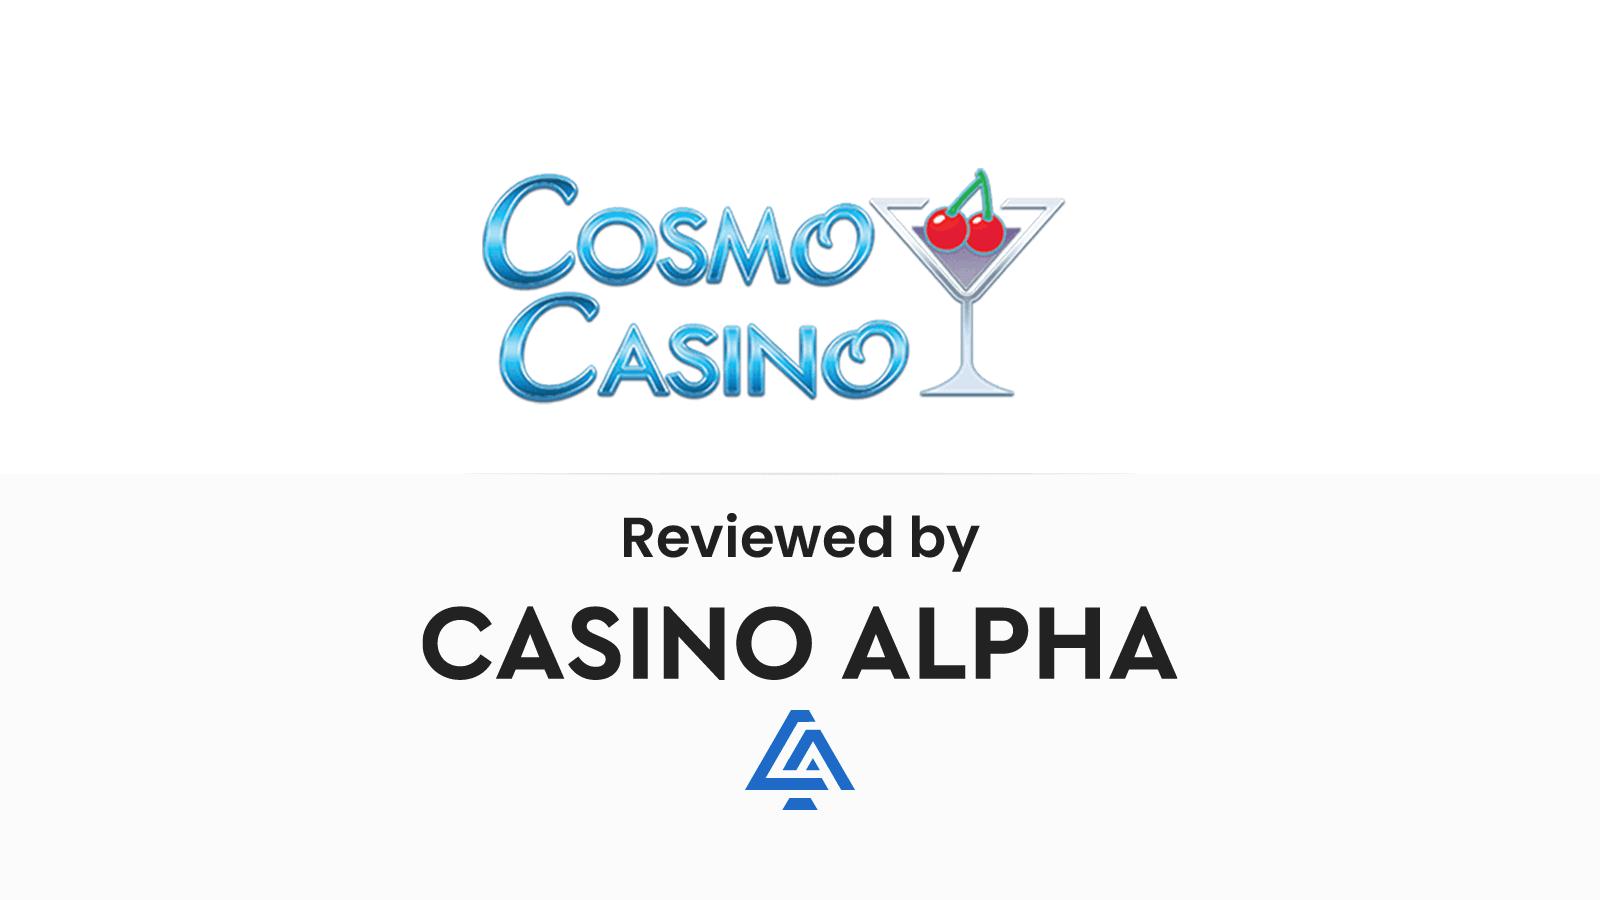 Cosmo Casino Review & Bonuses